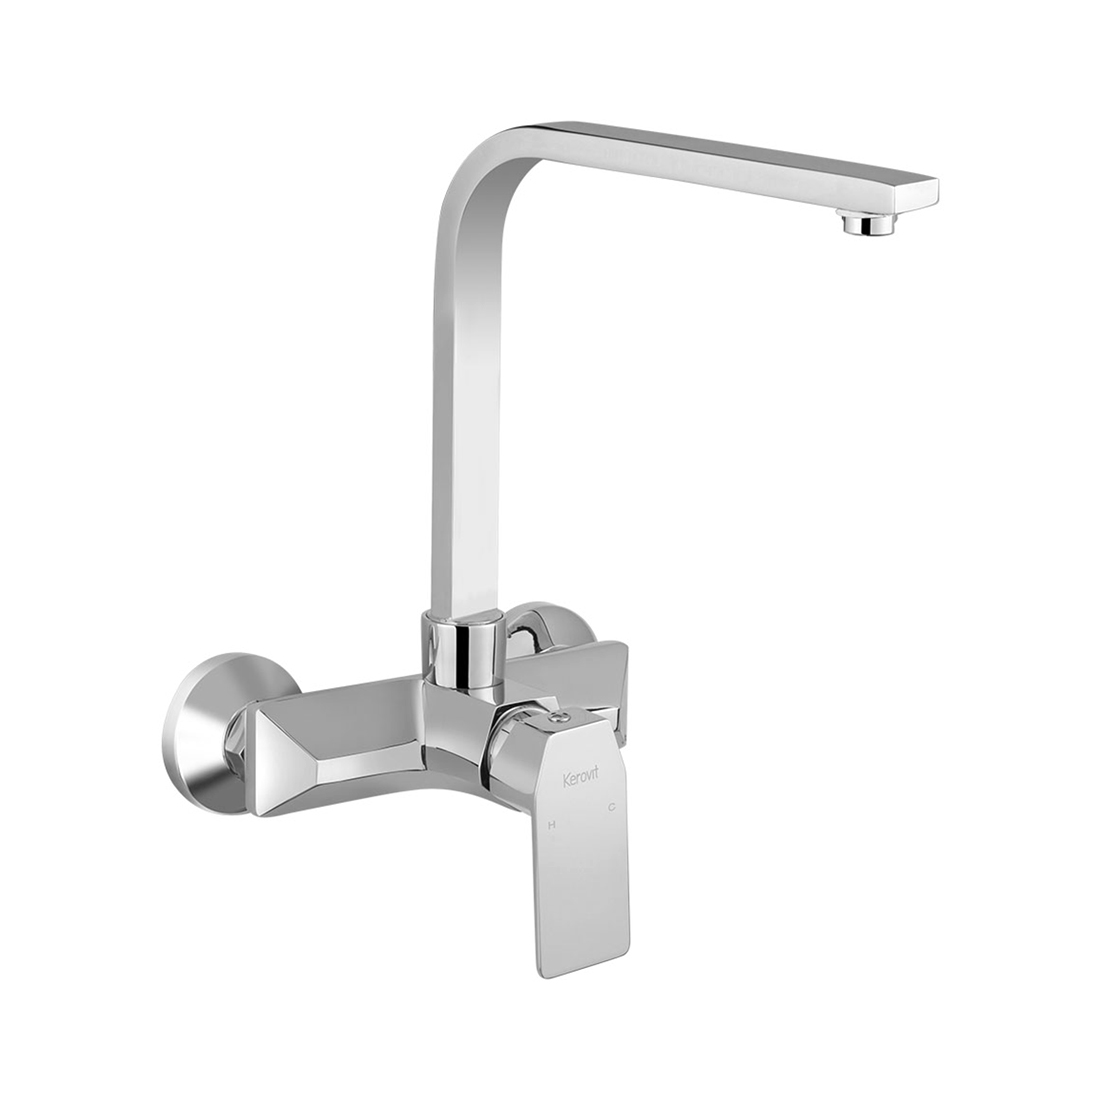 Kerovit Qua KB1011038 Single Lever Sink Mixer With Swivel Spout and Flanges